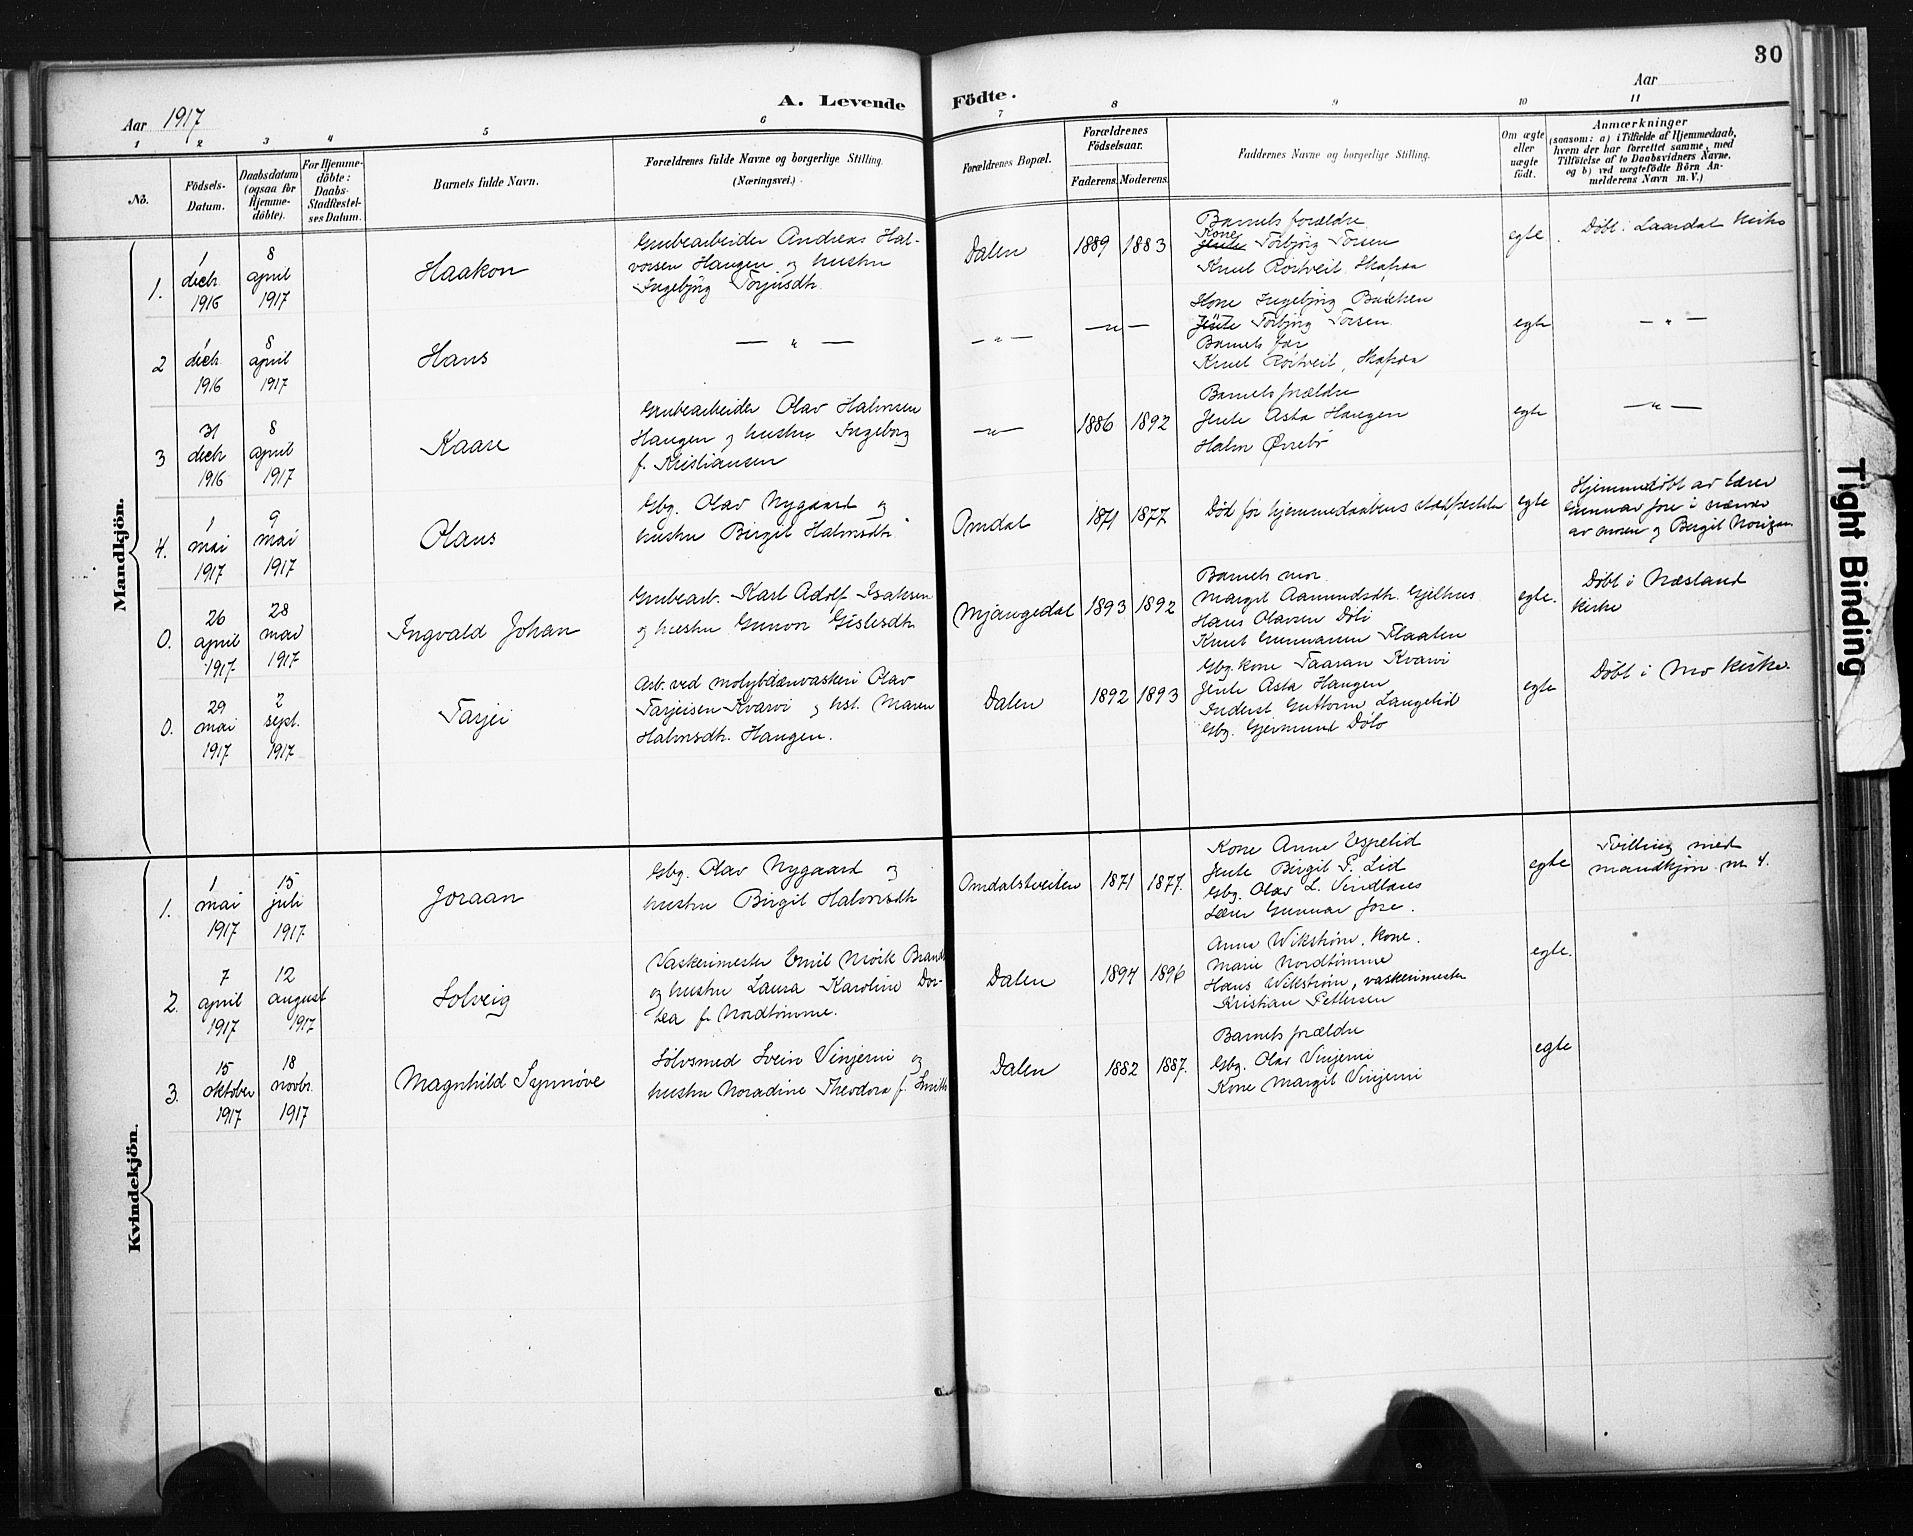 SAKO, Lårdal kirkebøker, F/Fb/L0002: Ministerialbok nr. II 2, 1887-1918, s. 30